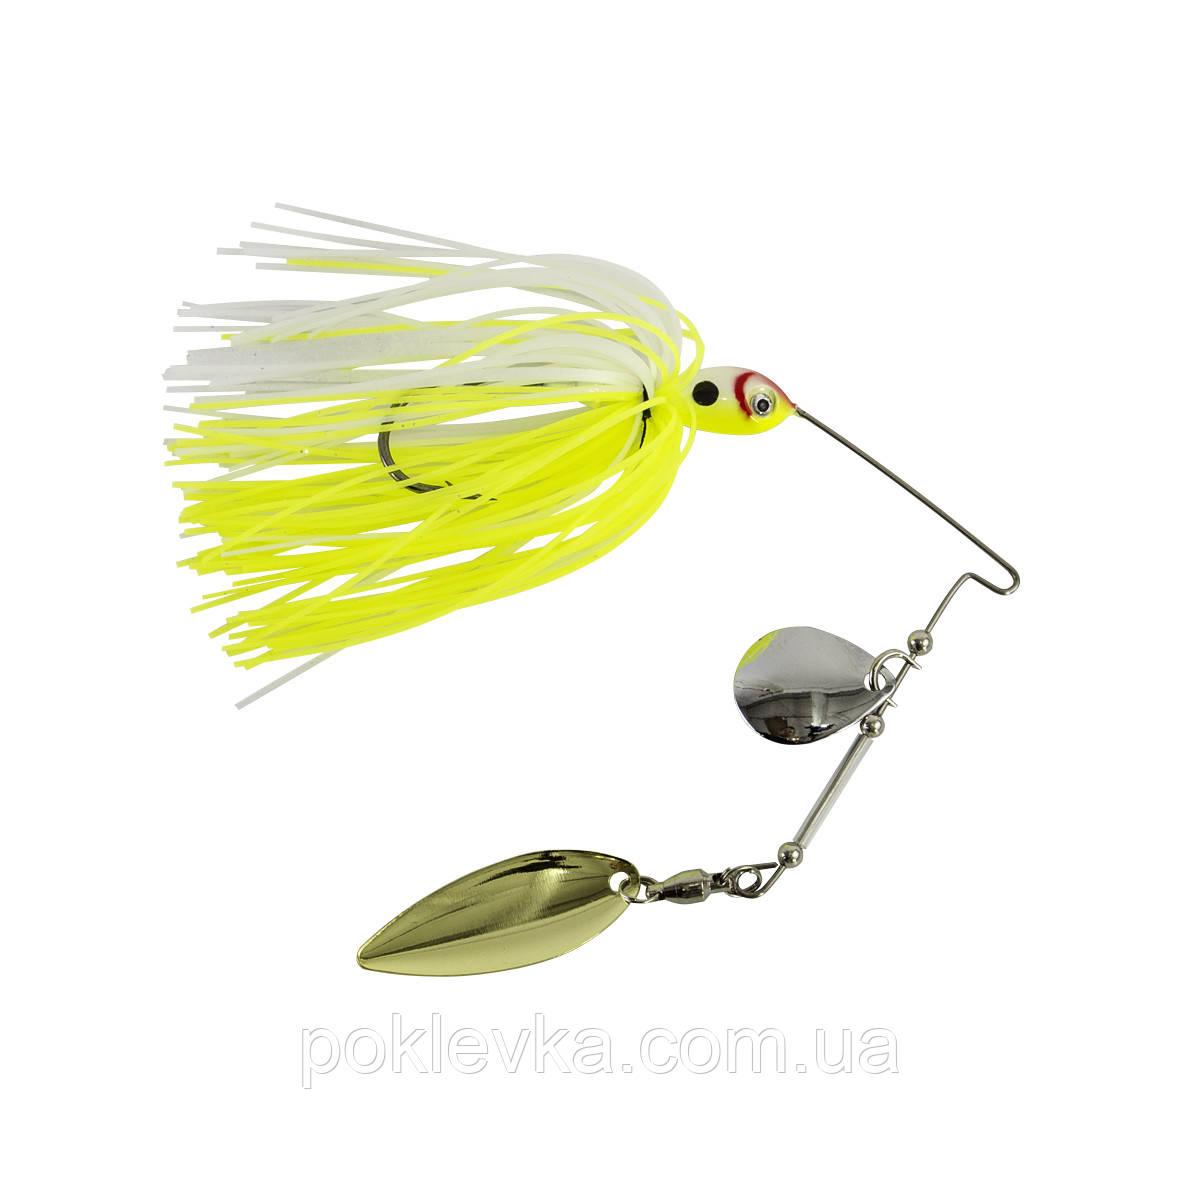 Spinner Bait Wizard 14г Yellow-White